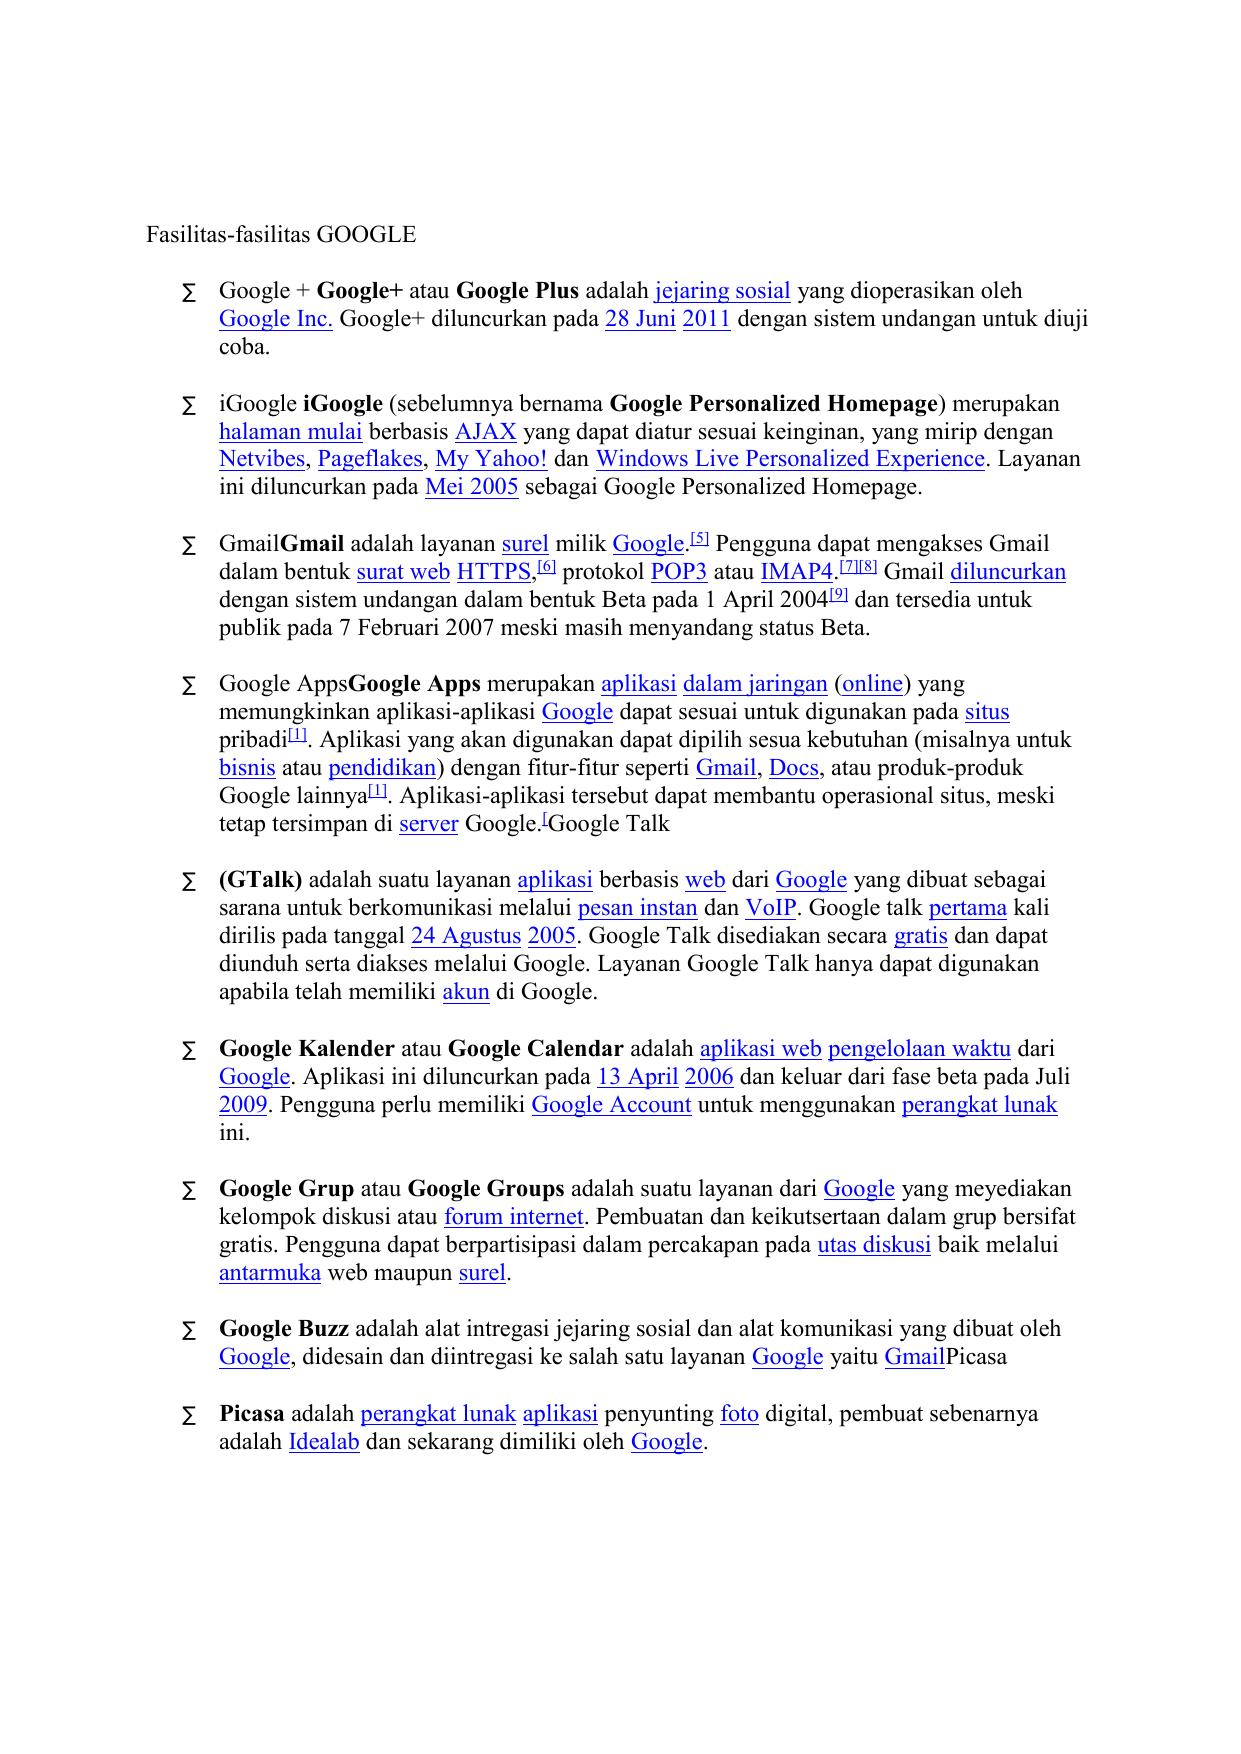 000467327 1 ef7f867efc09ab923f840efd737eb5c5 - Jenis Jenis Search Engine Dan Alamat Situsnya